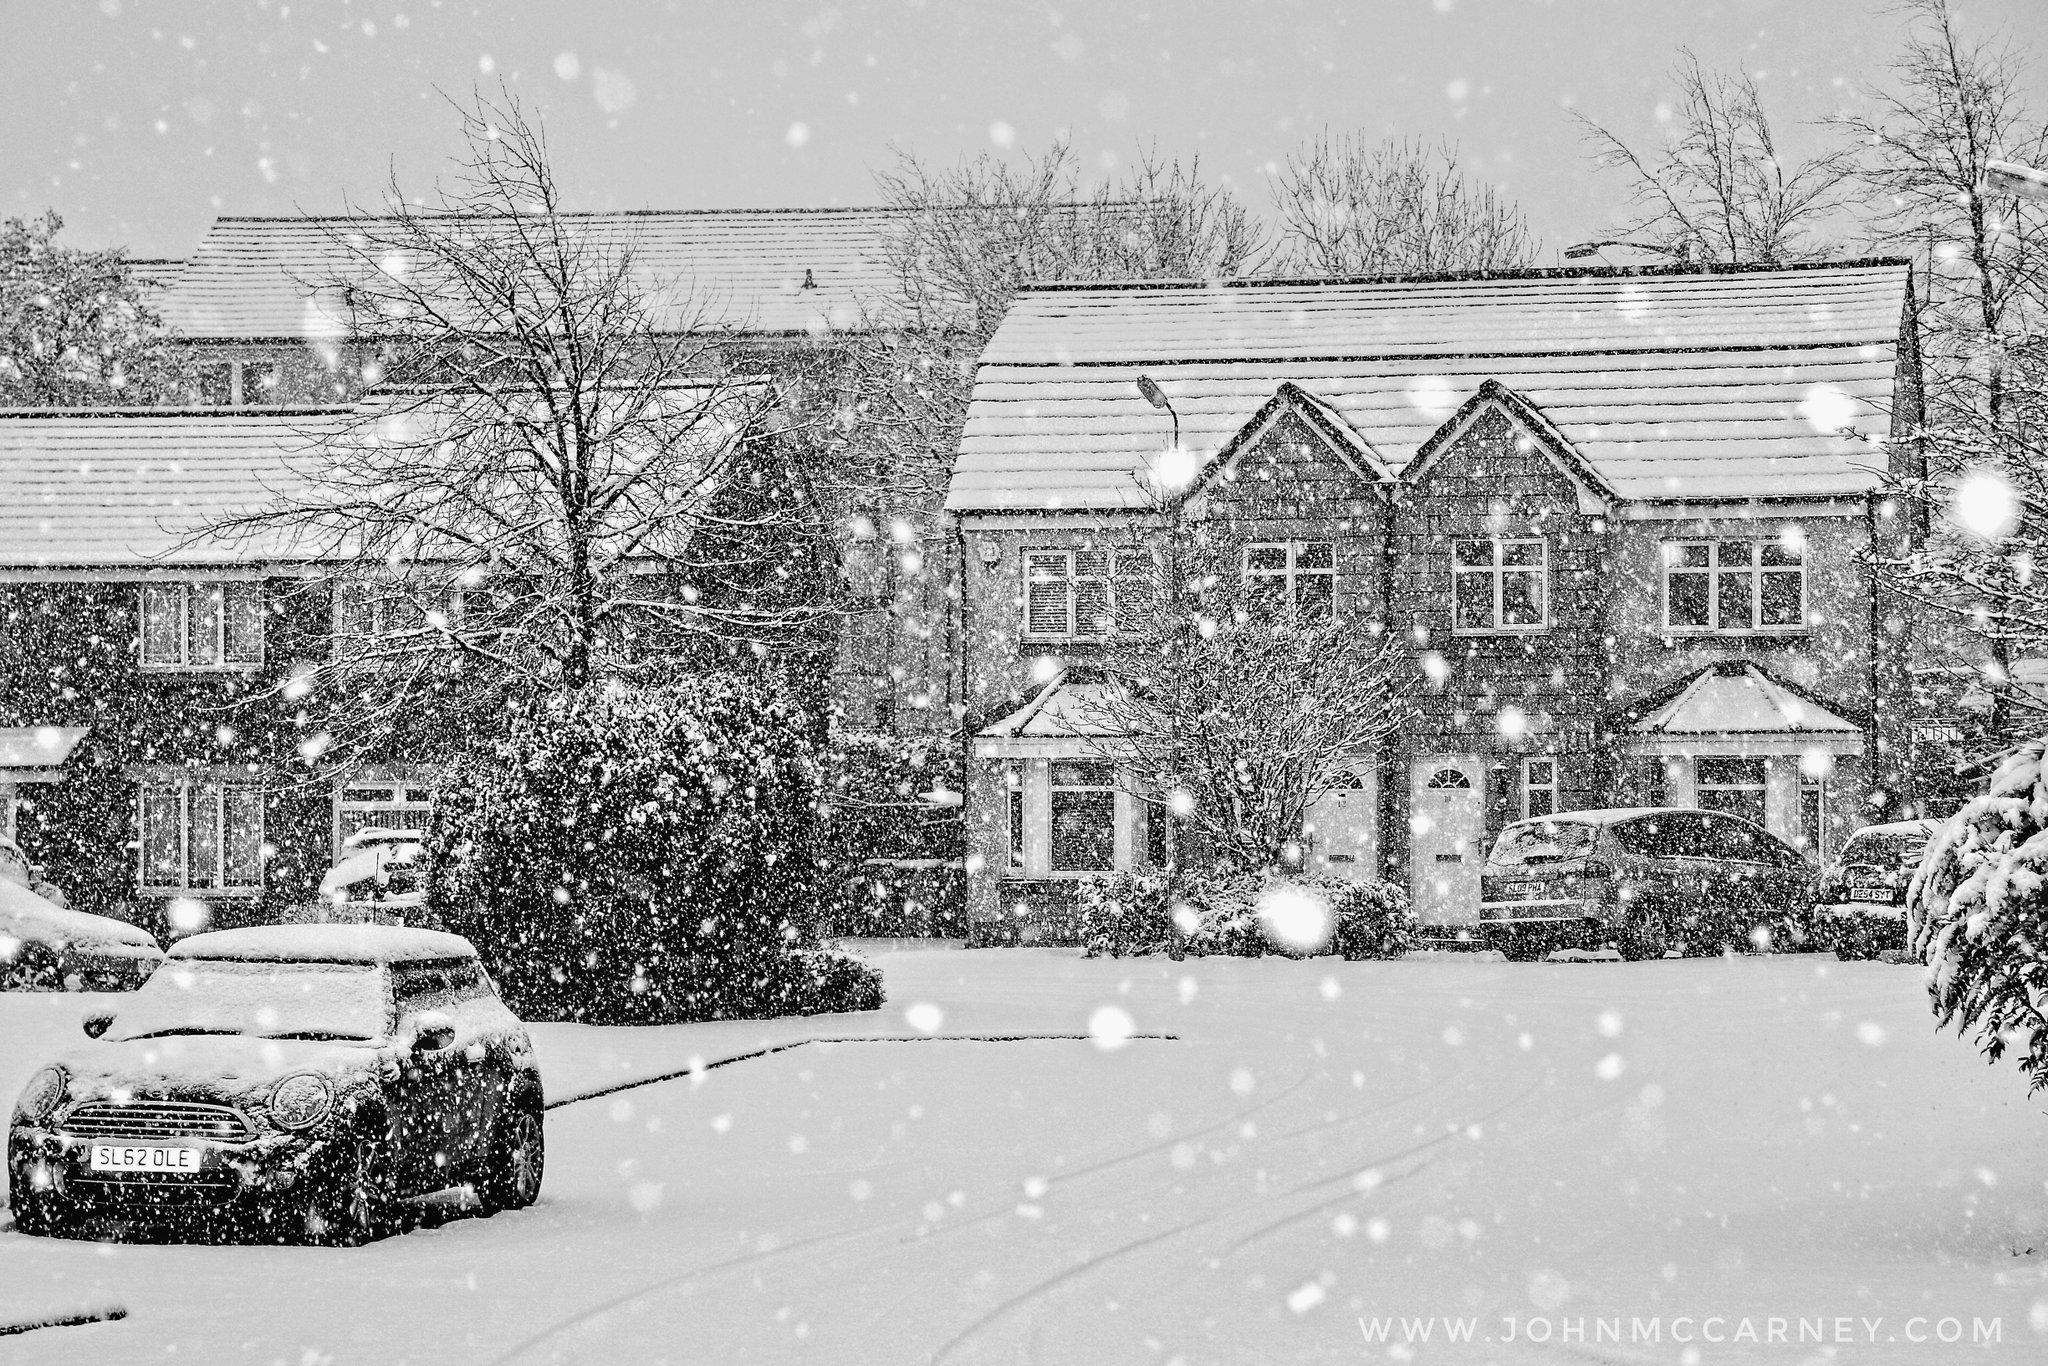 Obligatory Glasgow Snow Scene  #onthebandwagon #photography #StormHour Website: https://t.co/J7yVH0Nmc7 https://t.co/wxErMMzIYM